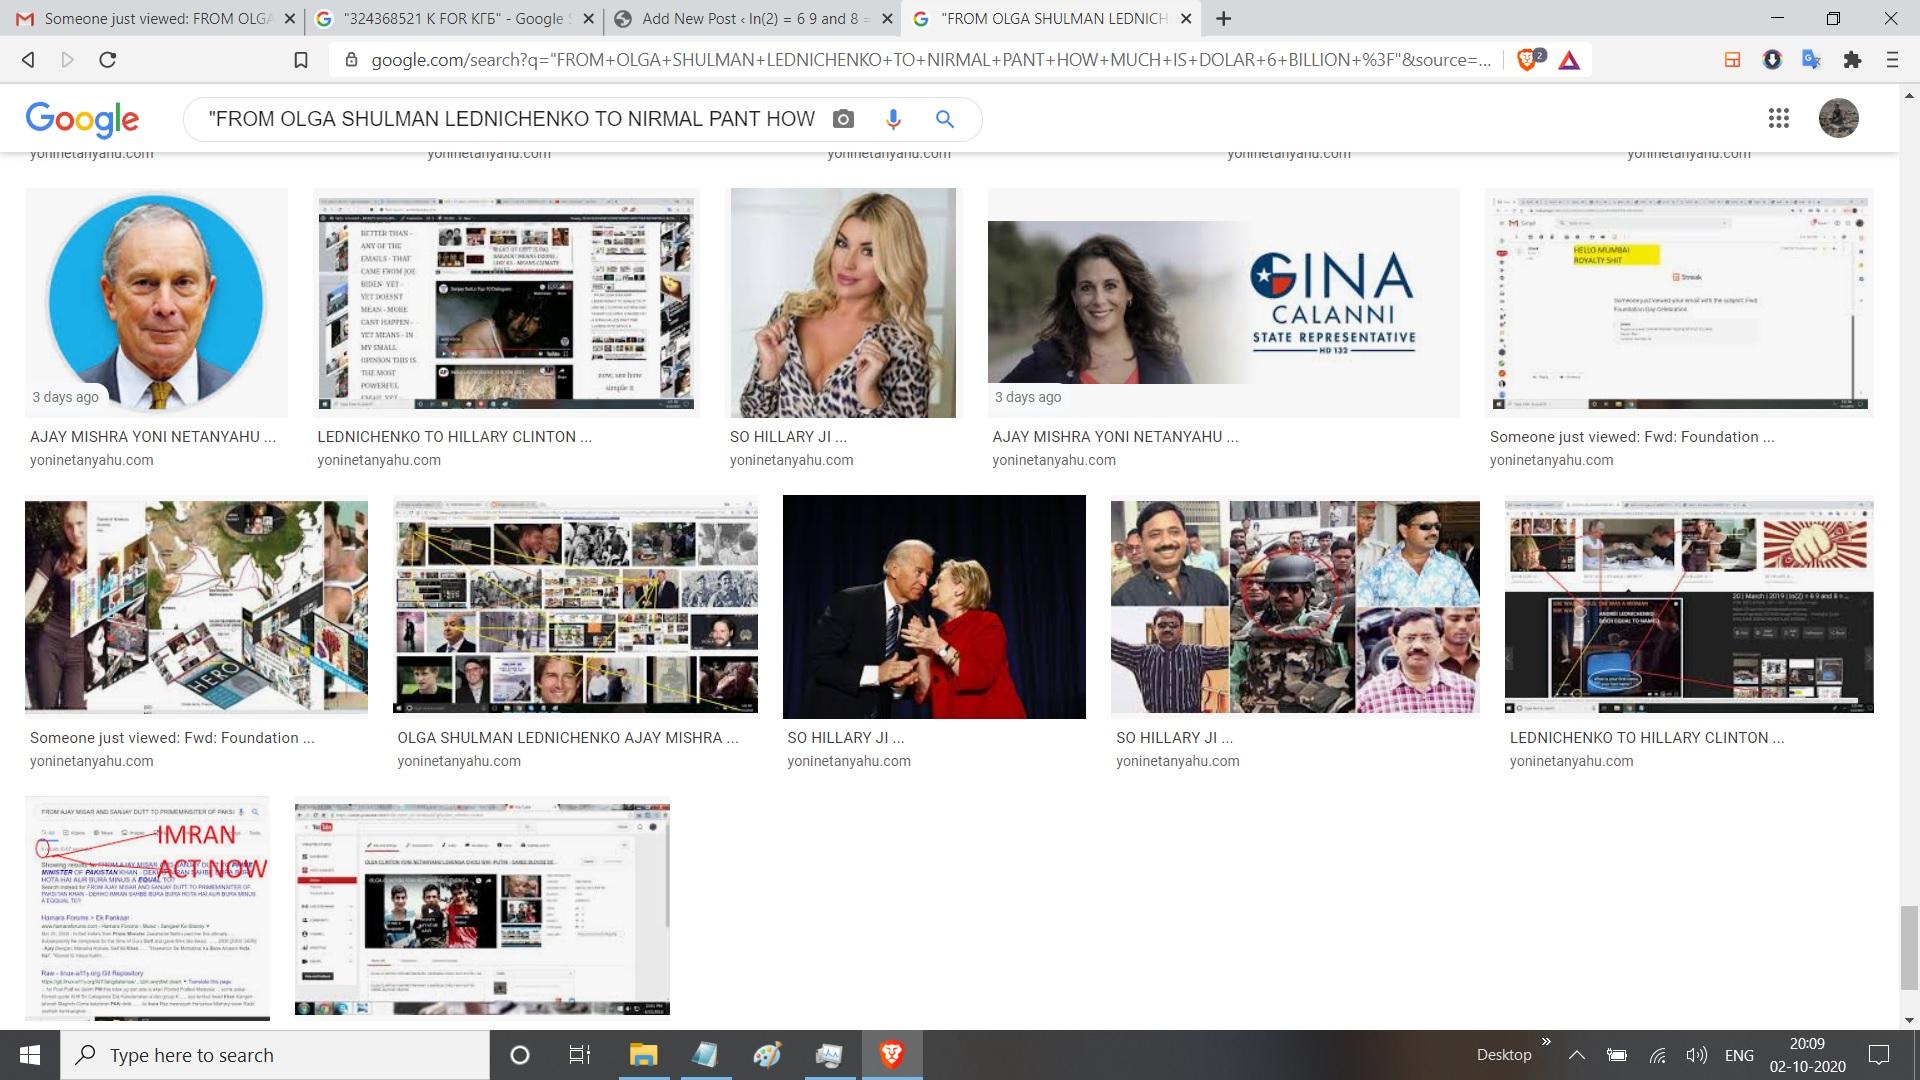 FROM OLGA SHULMAN LEDNICHENKO TO NIRMAL PANT HOW MUCH IS DOLAR 6 BILLION